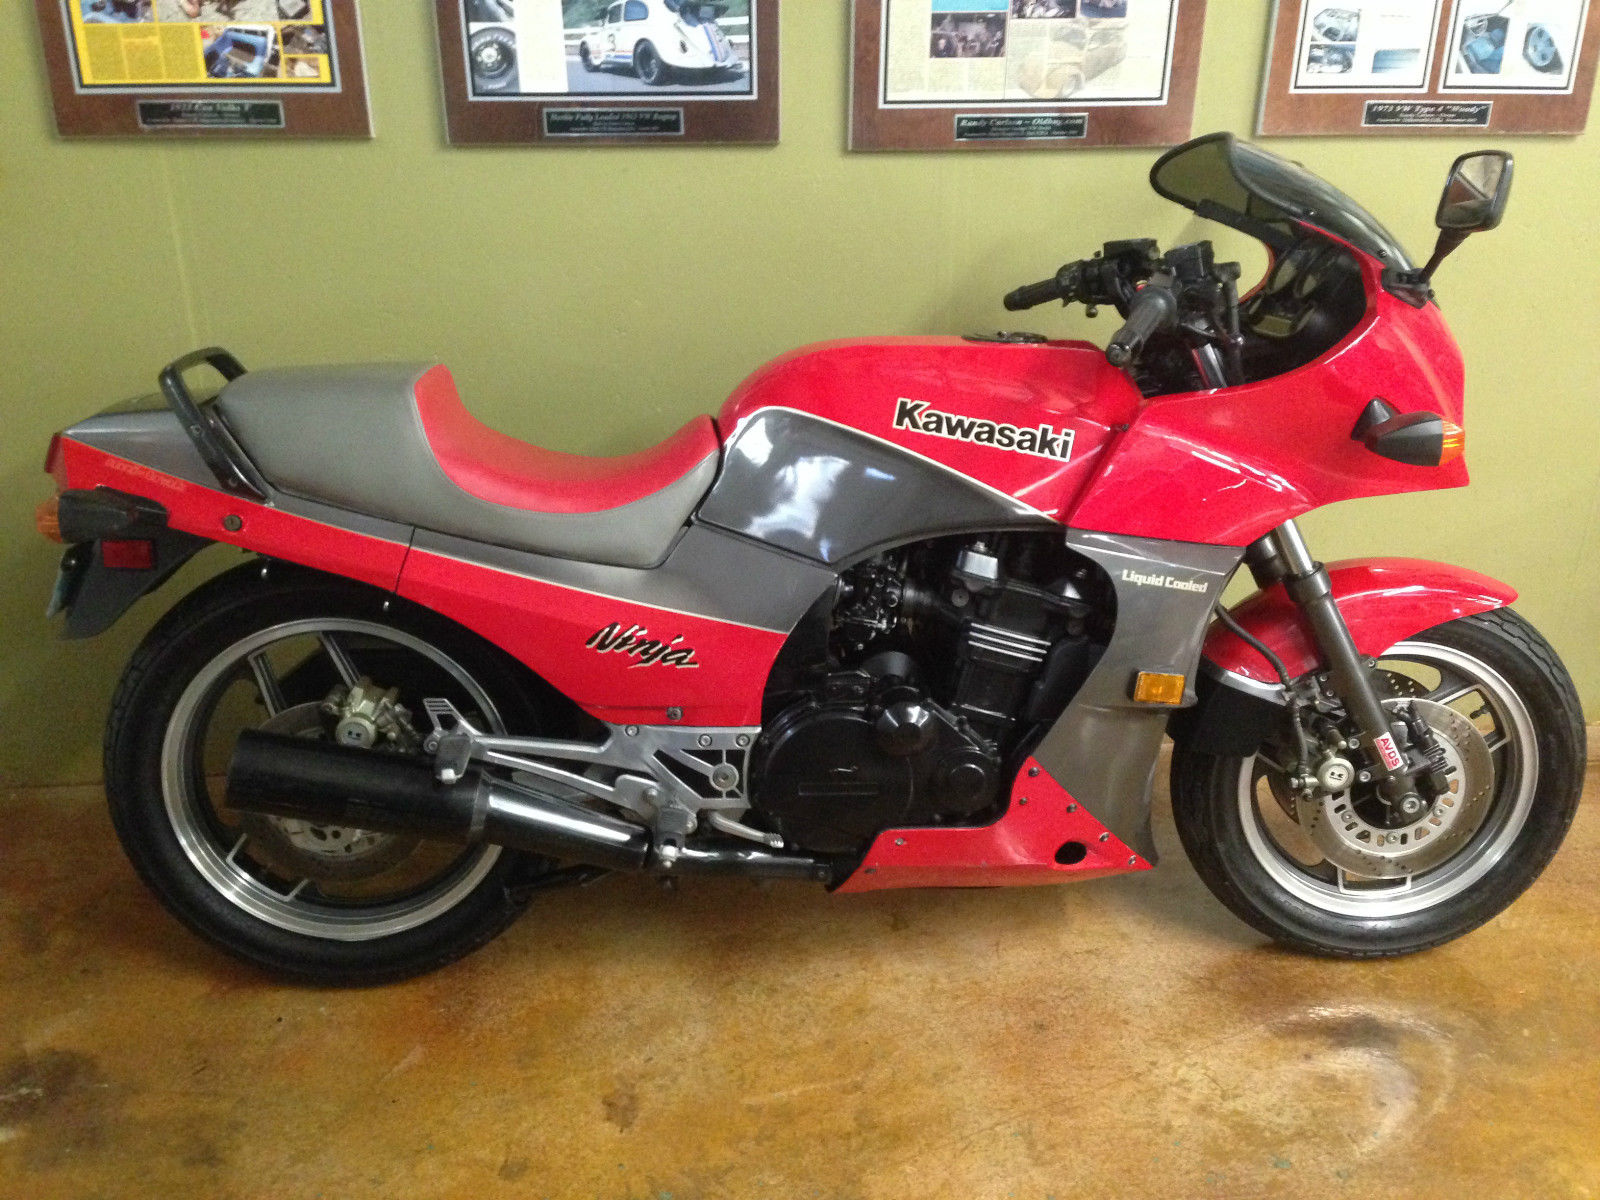 1090 Miles 1984 Kawasaki Ninja Gpz900r Bike Urious